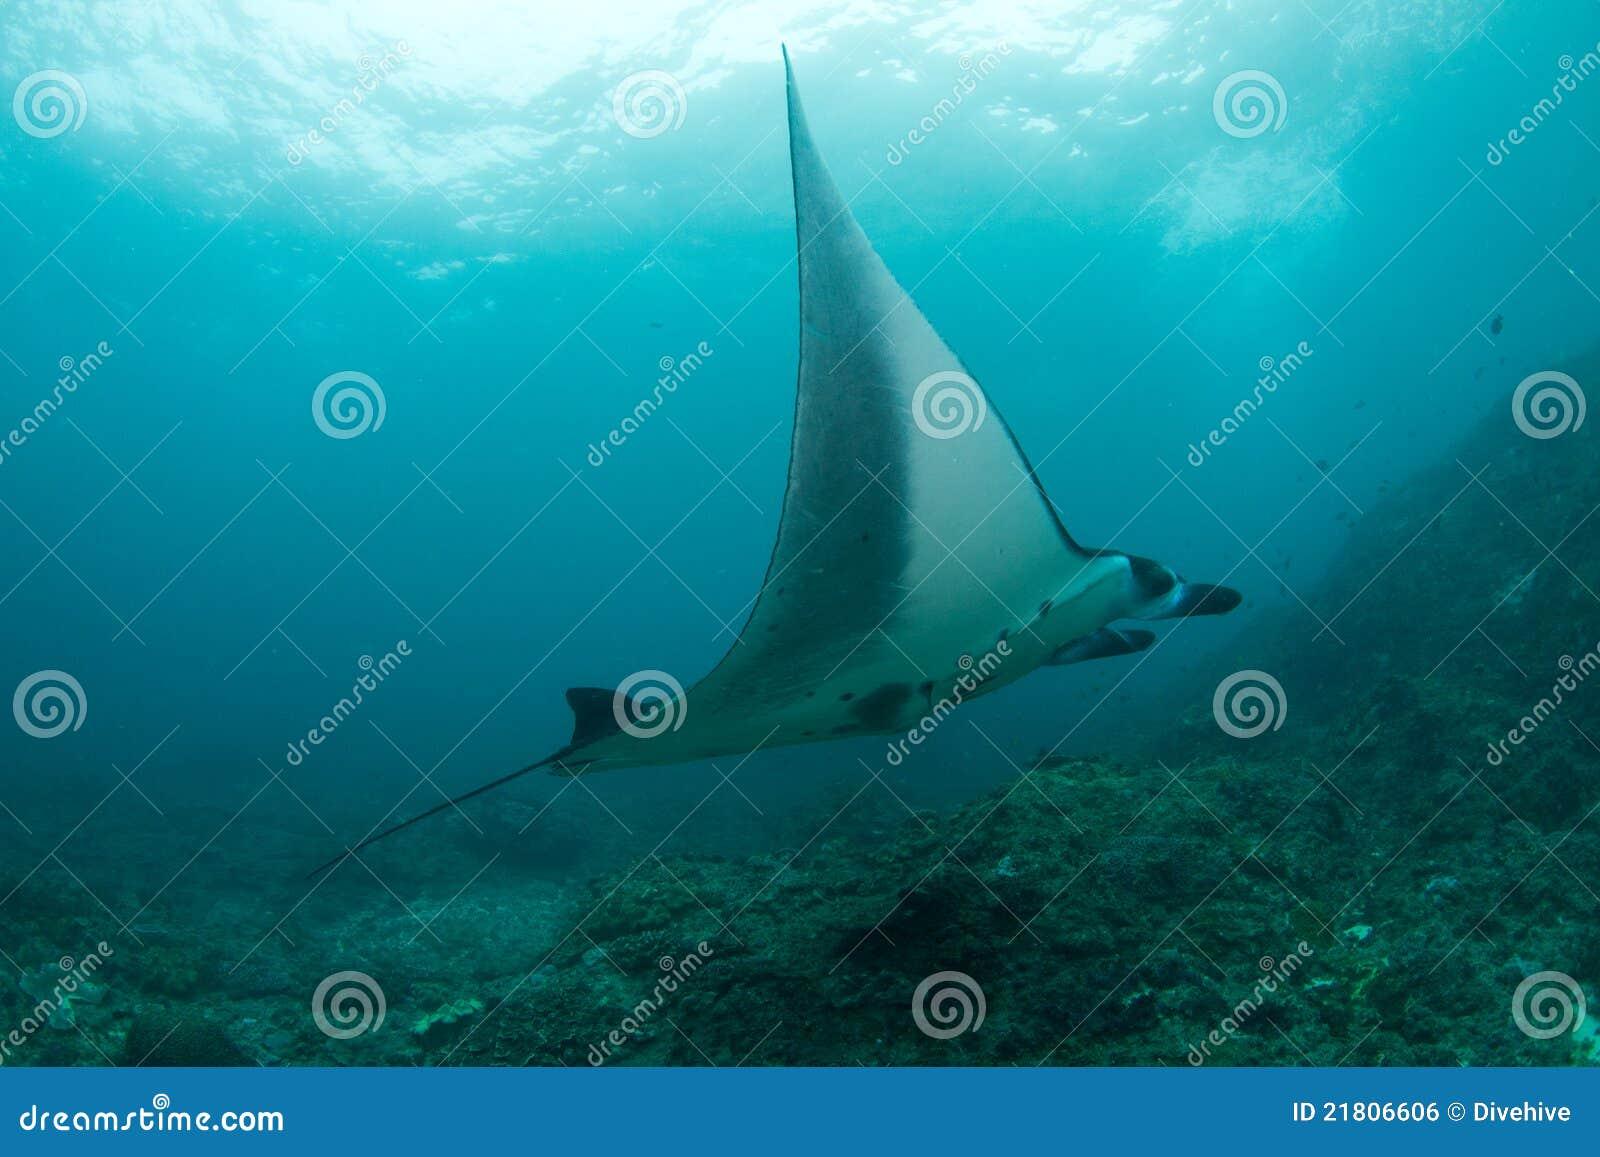 Huge manta ray swimming in the ocean